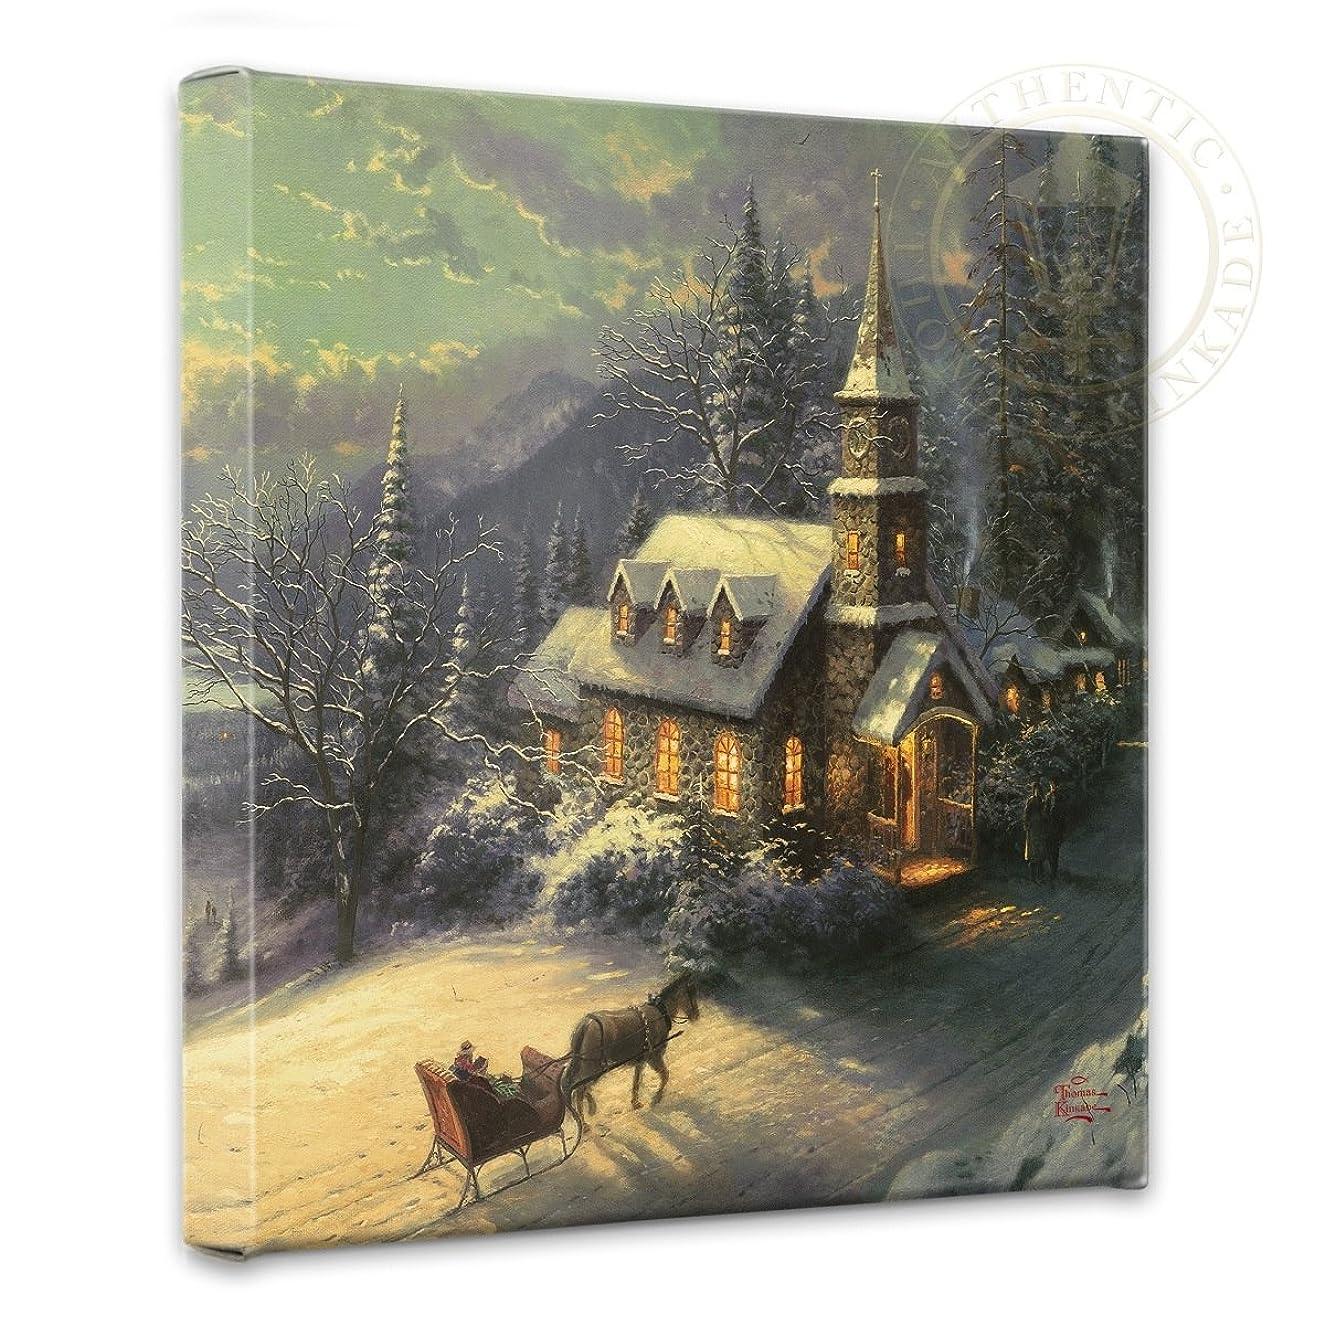 Thomas Kinkade Sunday Evening Sleigh Ride 14 x 14 Gallery Wrapped Canvas